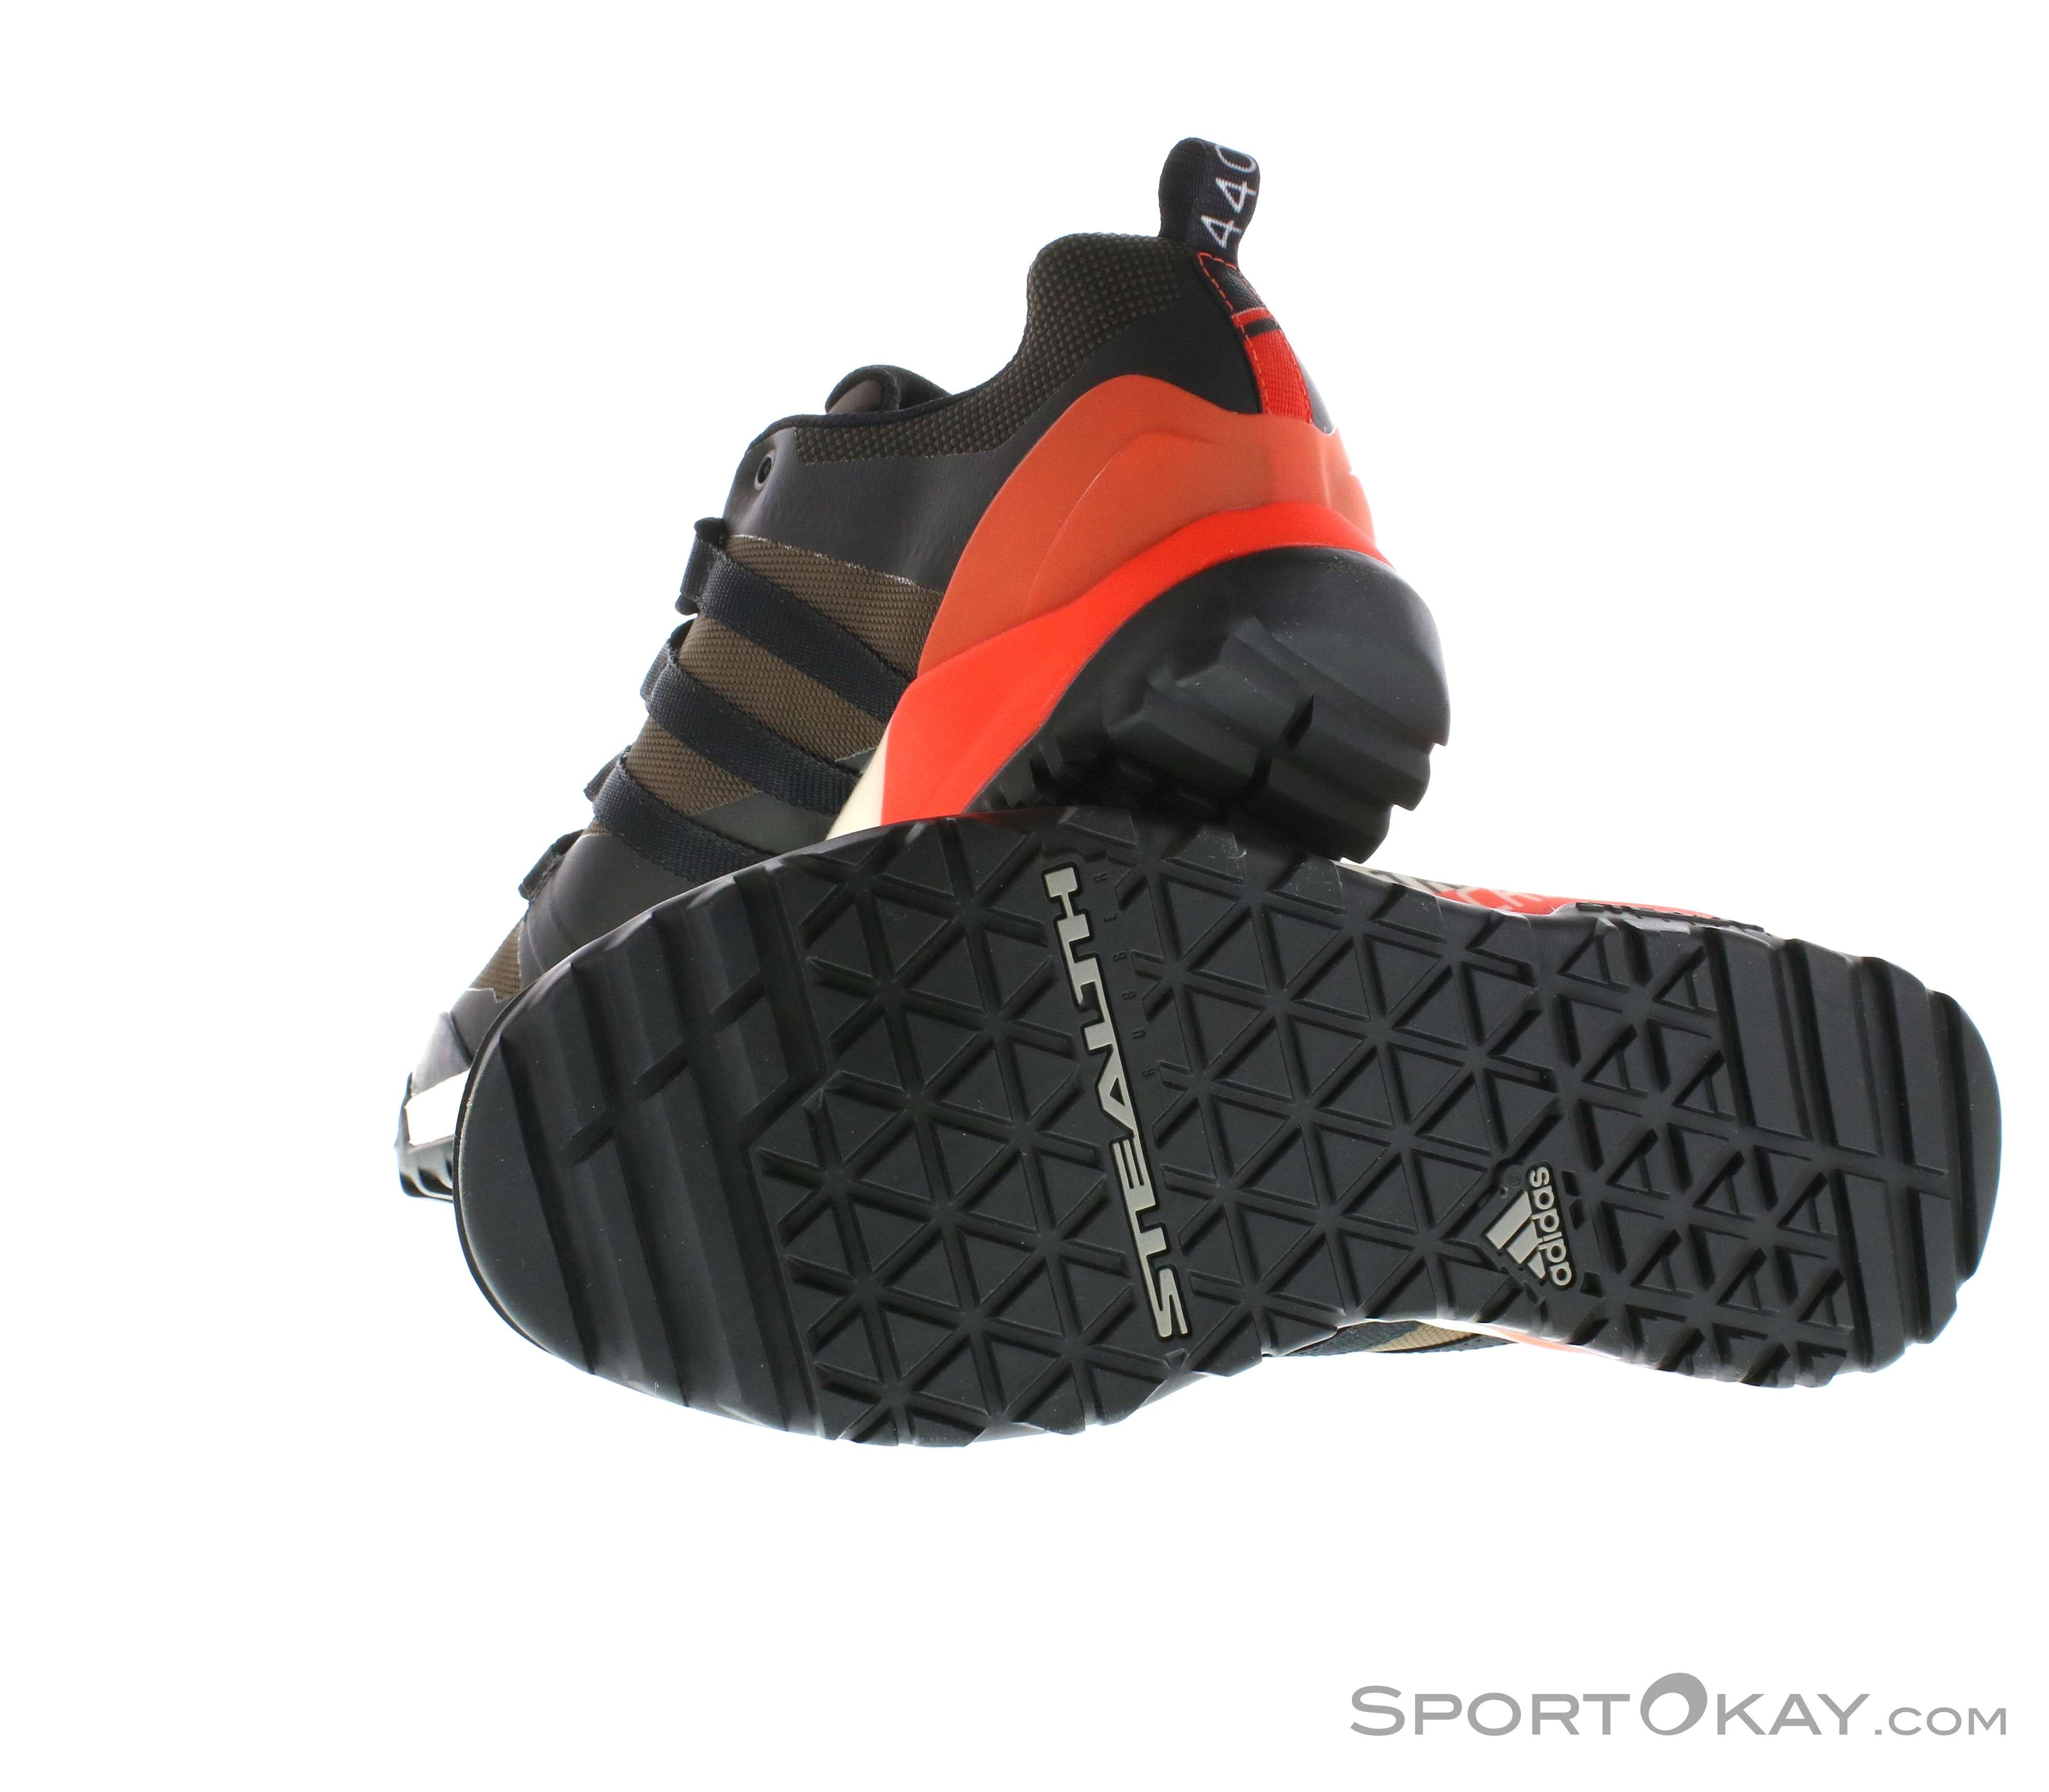 adidas Terrex Trail Cross SL Uomo Scarpe da Bici - Scarpe MTB ... 5e4a5c7209d